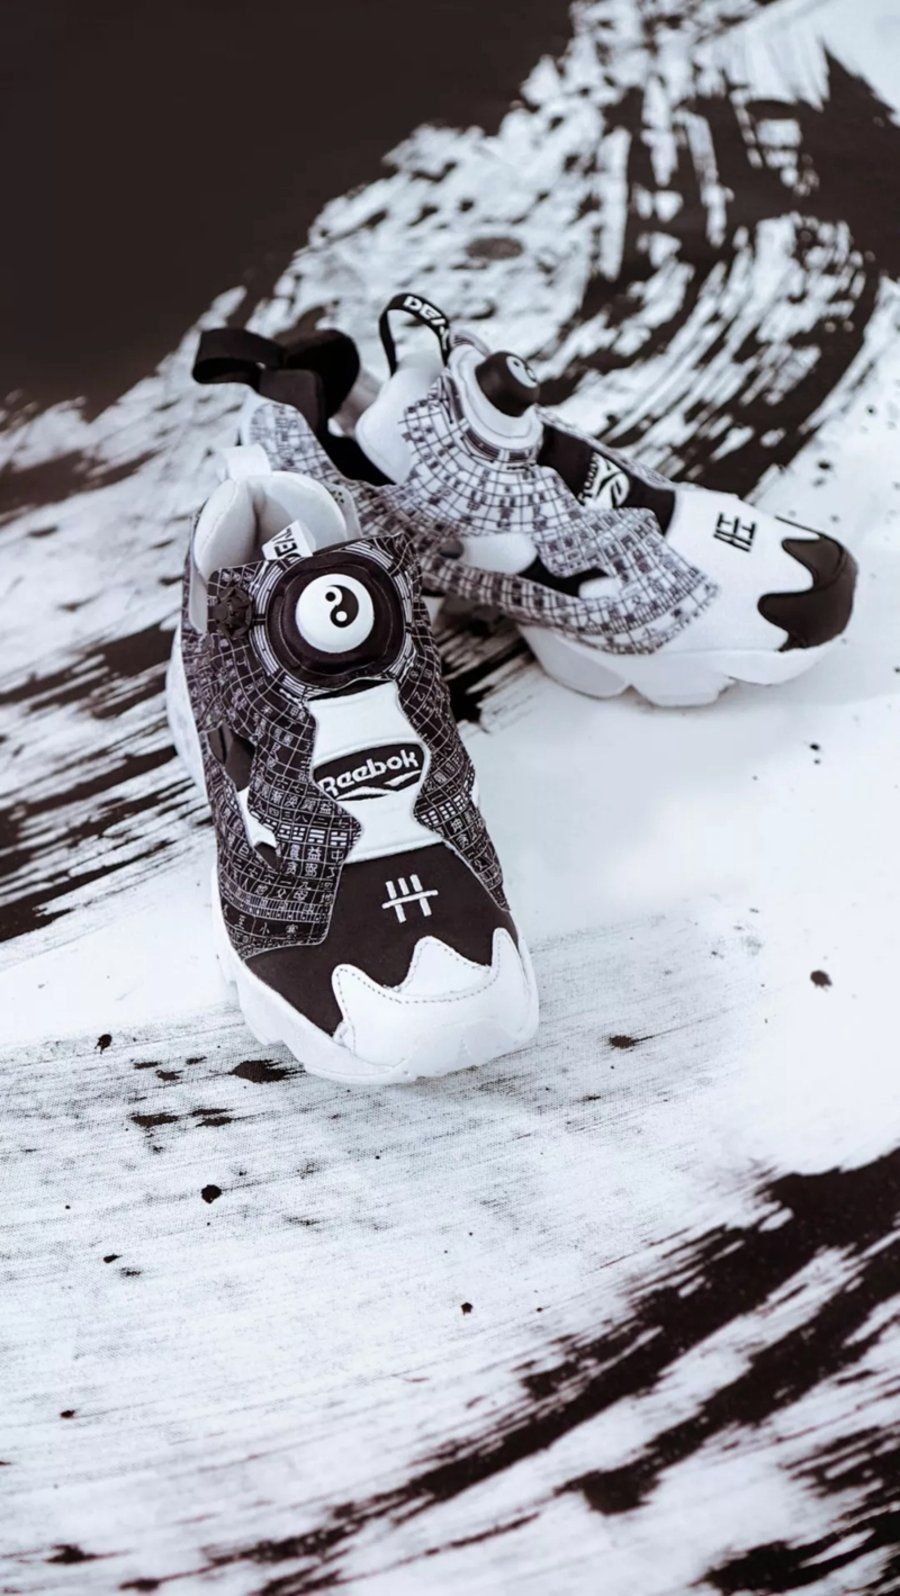 Rebook  鞋面融合风水元素!DEAL x Reebok 联名鞋款即将发售!